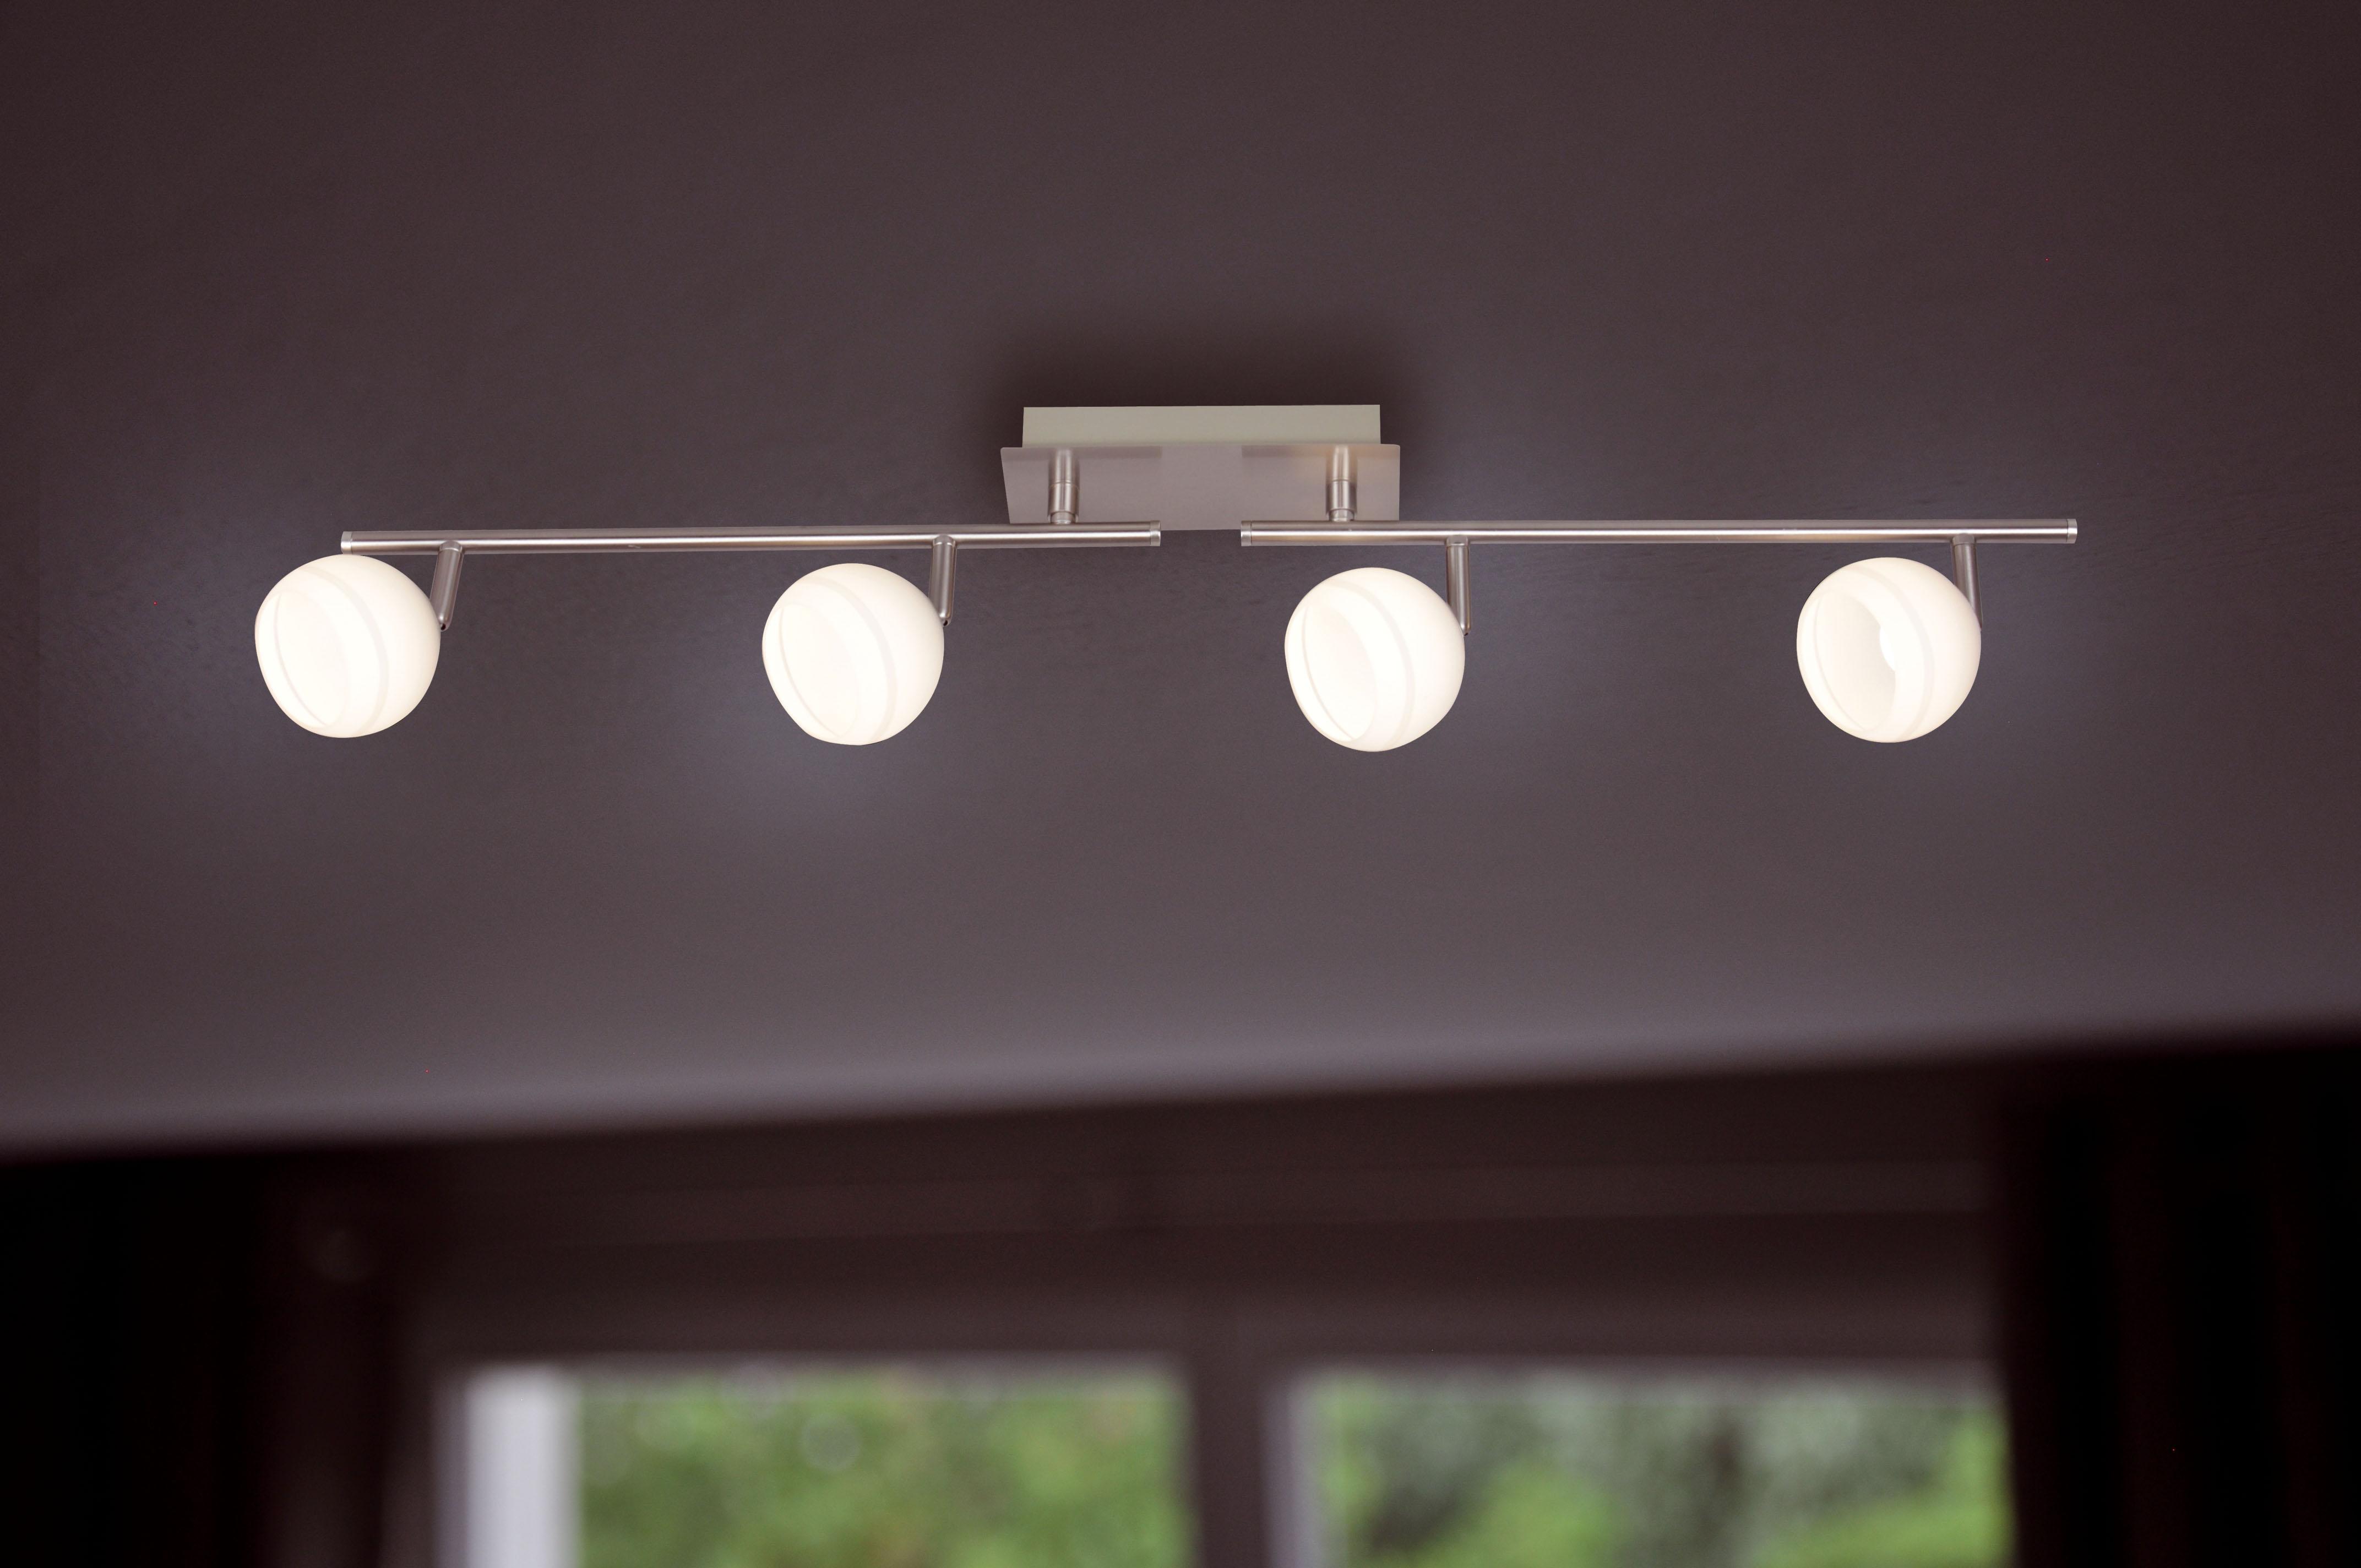 Wofi Spotové svítidlo CARA 4x LED 5 W matný nikl WO 7535.04.64.0000